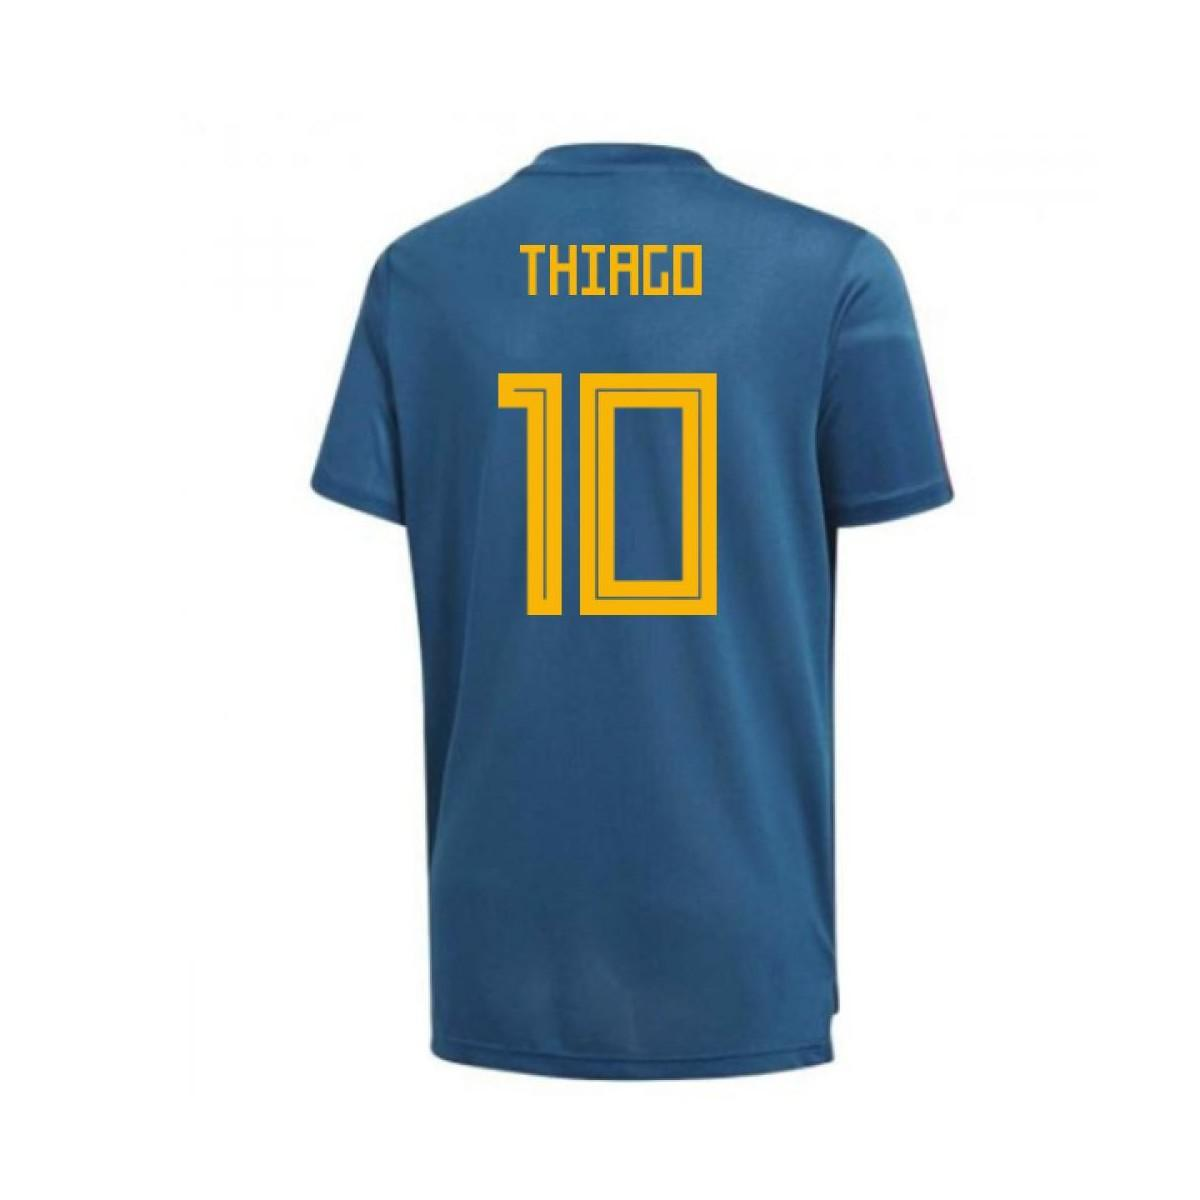 f988e3c6975 Adidas 2018-19 Spain Training Shirt (thiago 10) Men s T Shirt In ...